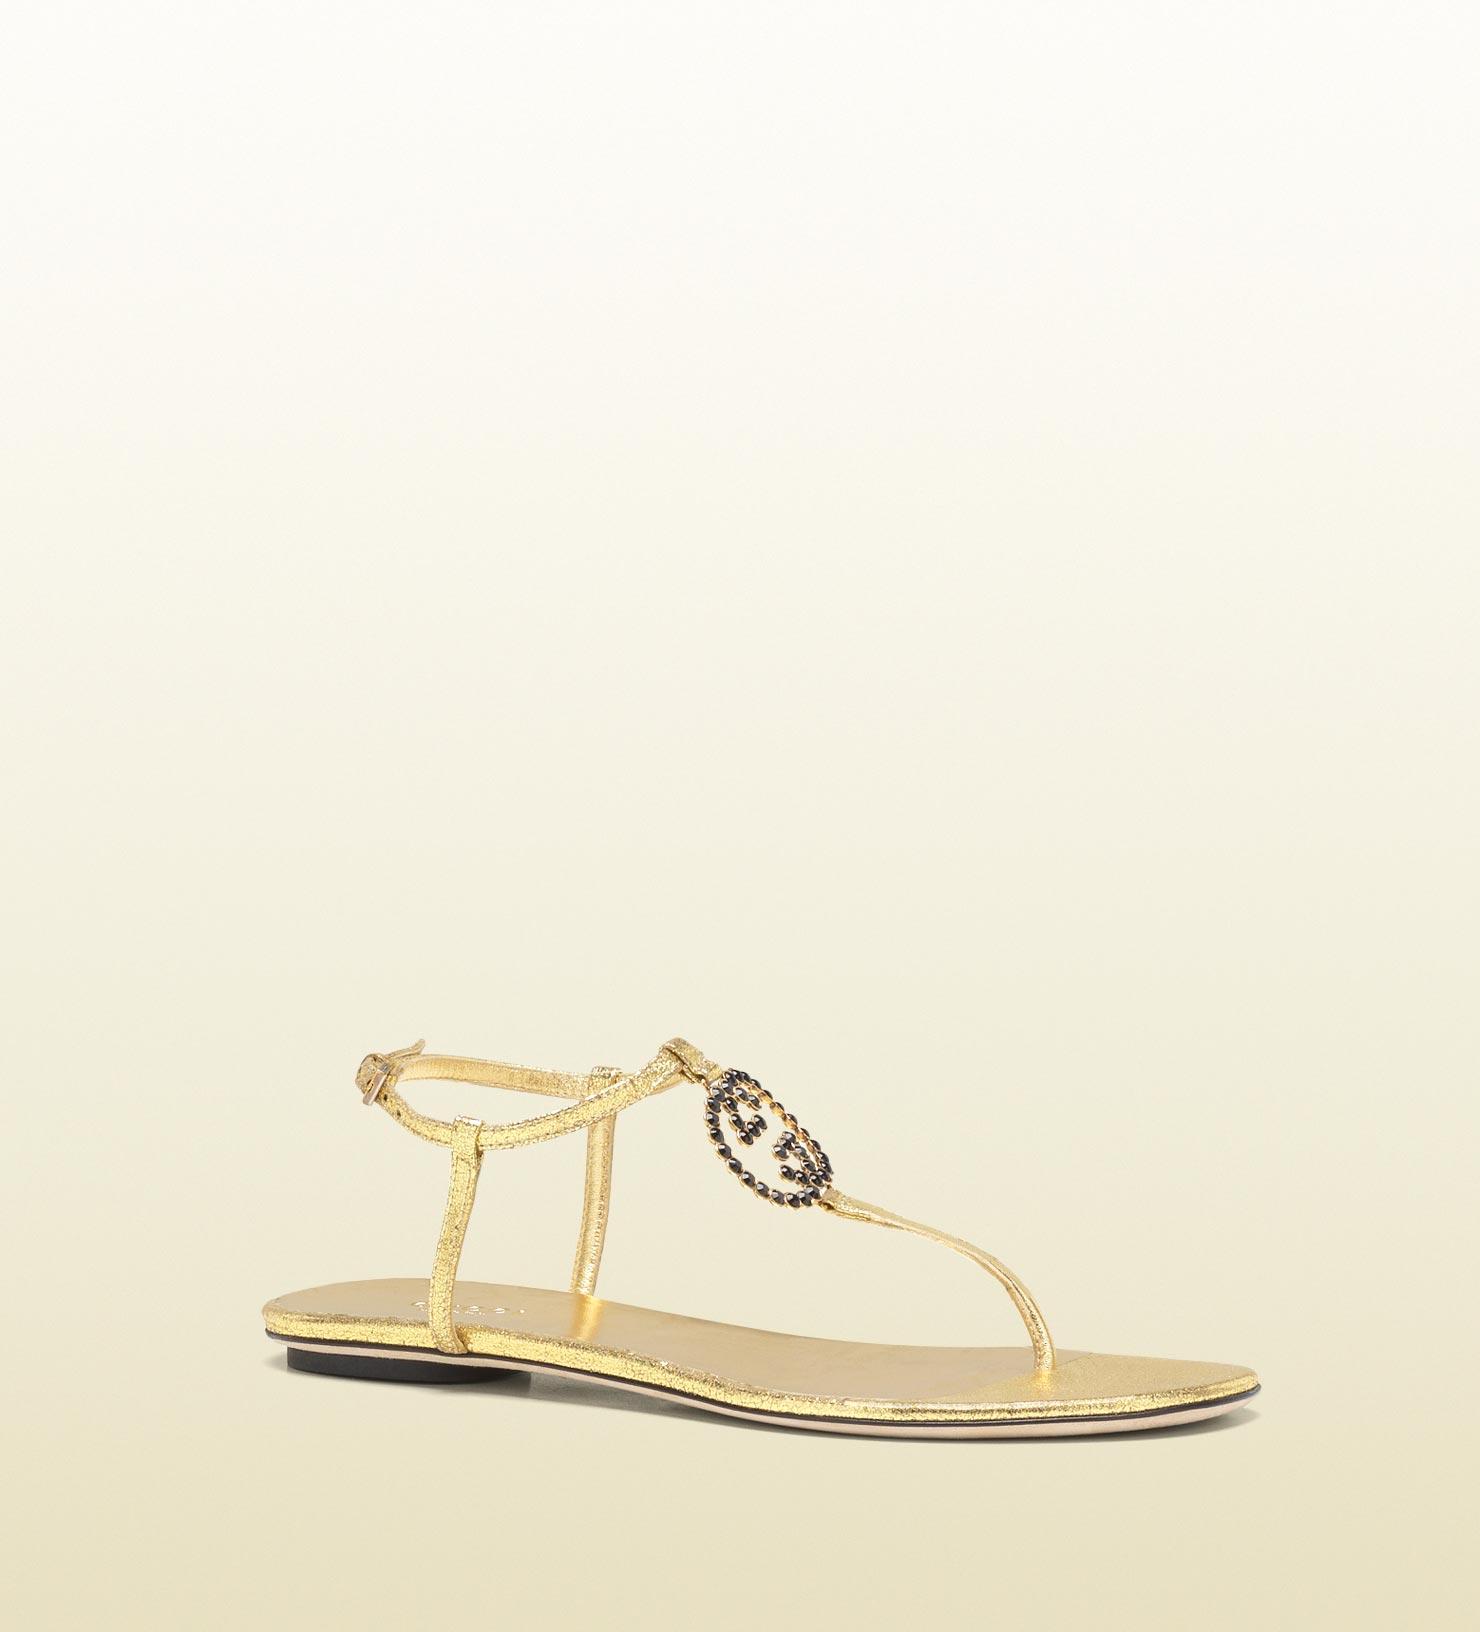 289c3a822 Gucci Katlin Jeweled Interlocking G Flat Thong Sandal in Metallic - Lyst